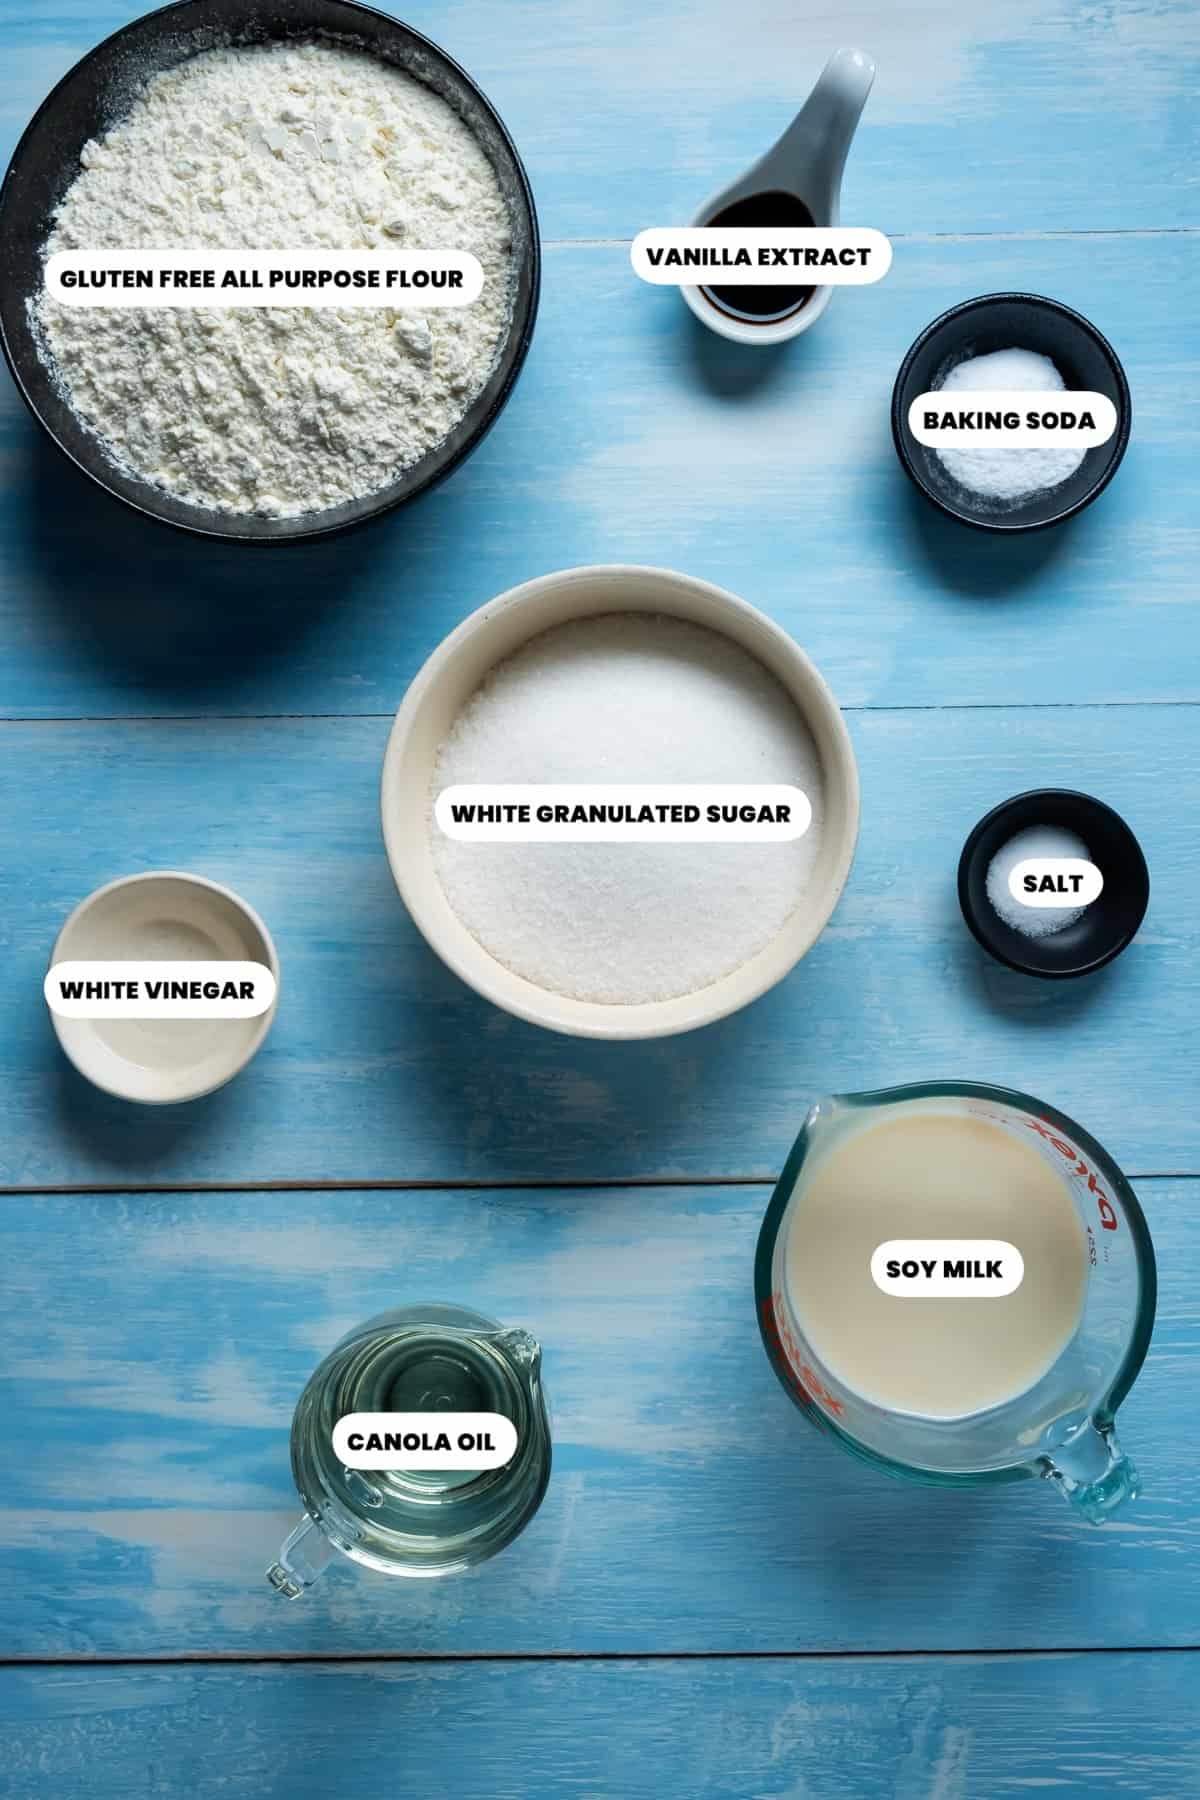 Photo of the ingredients needed to make vegan gluten free vanilla cupcakes.